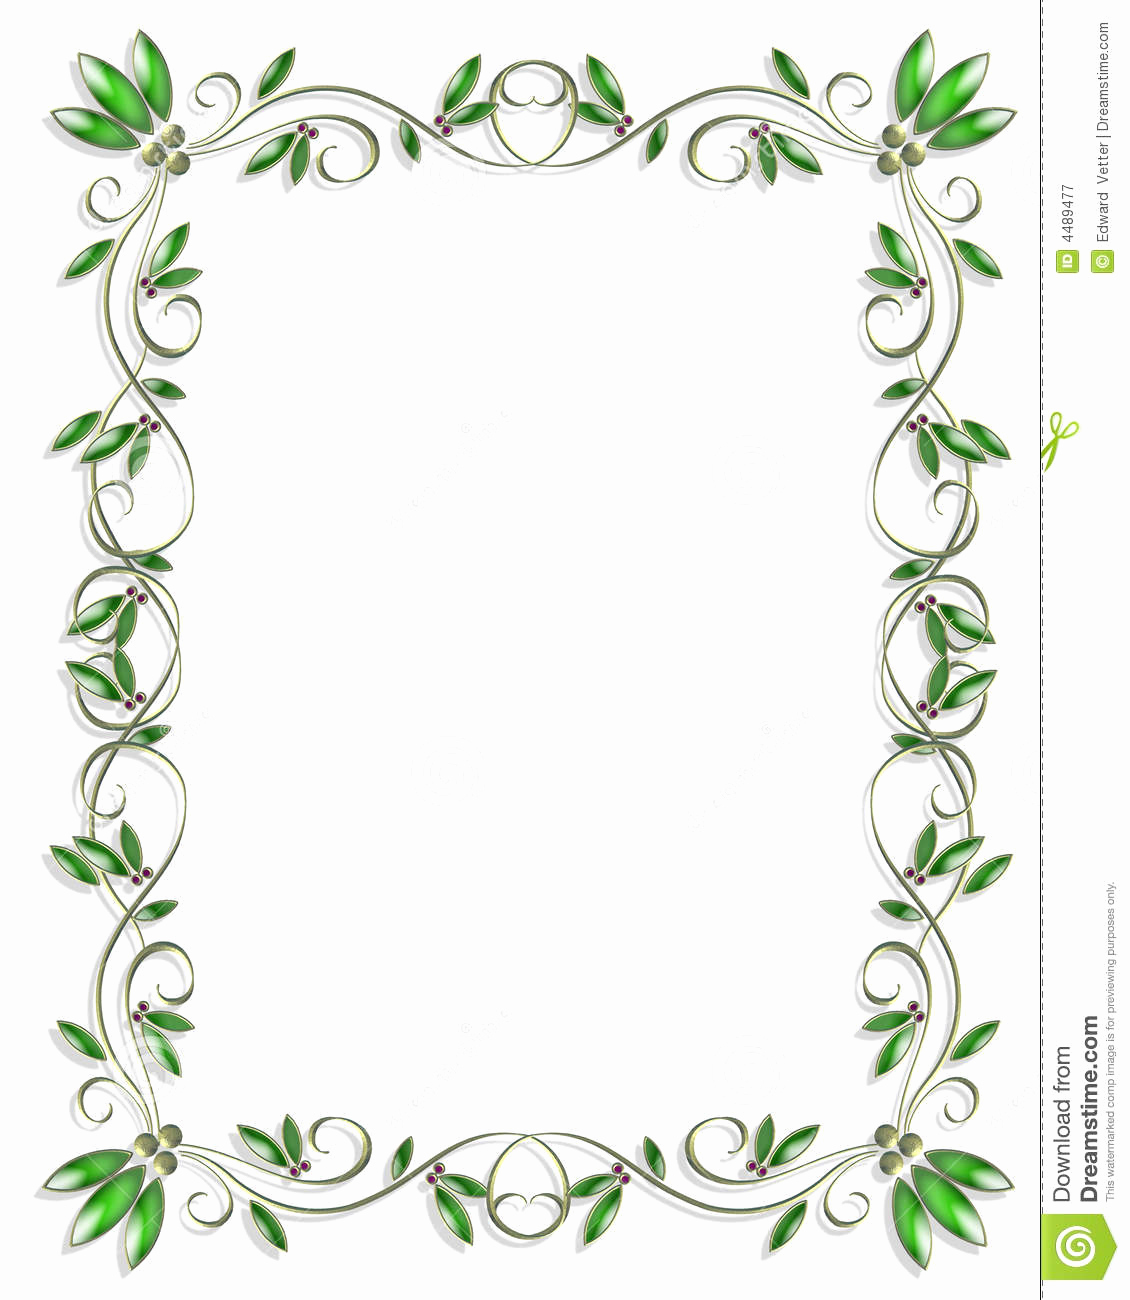 Wedding Invitation Borders Design Inspirational Border Design Element Green 3 Stock Illustration